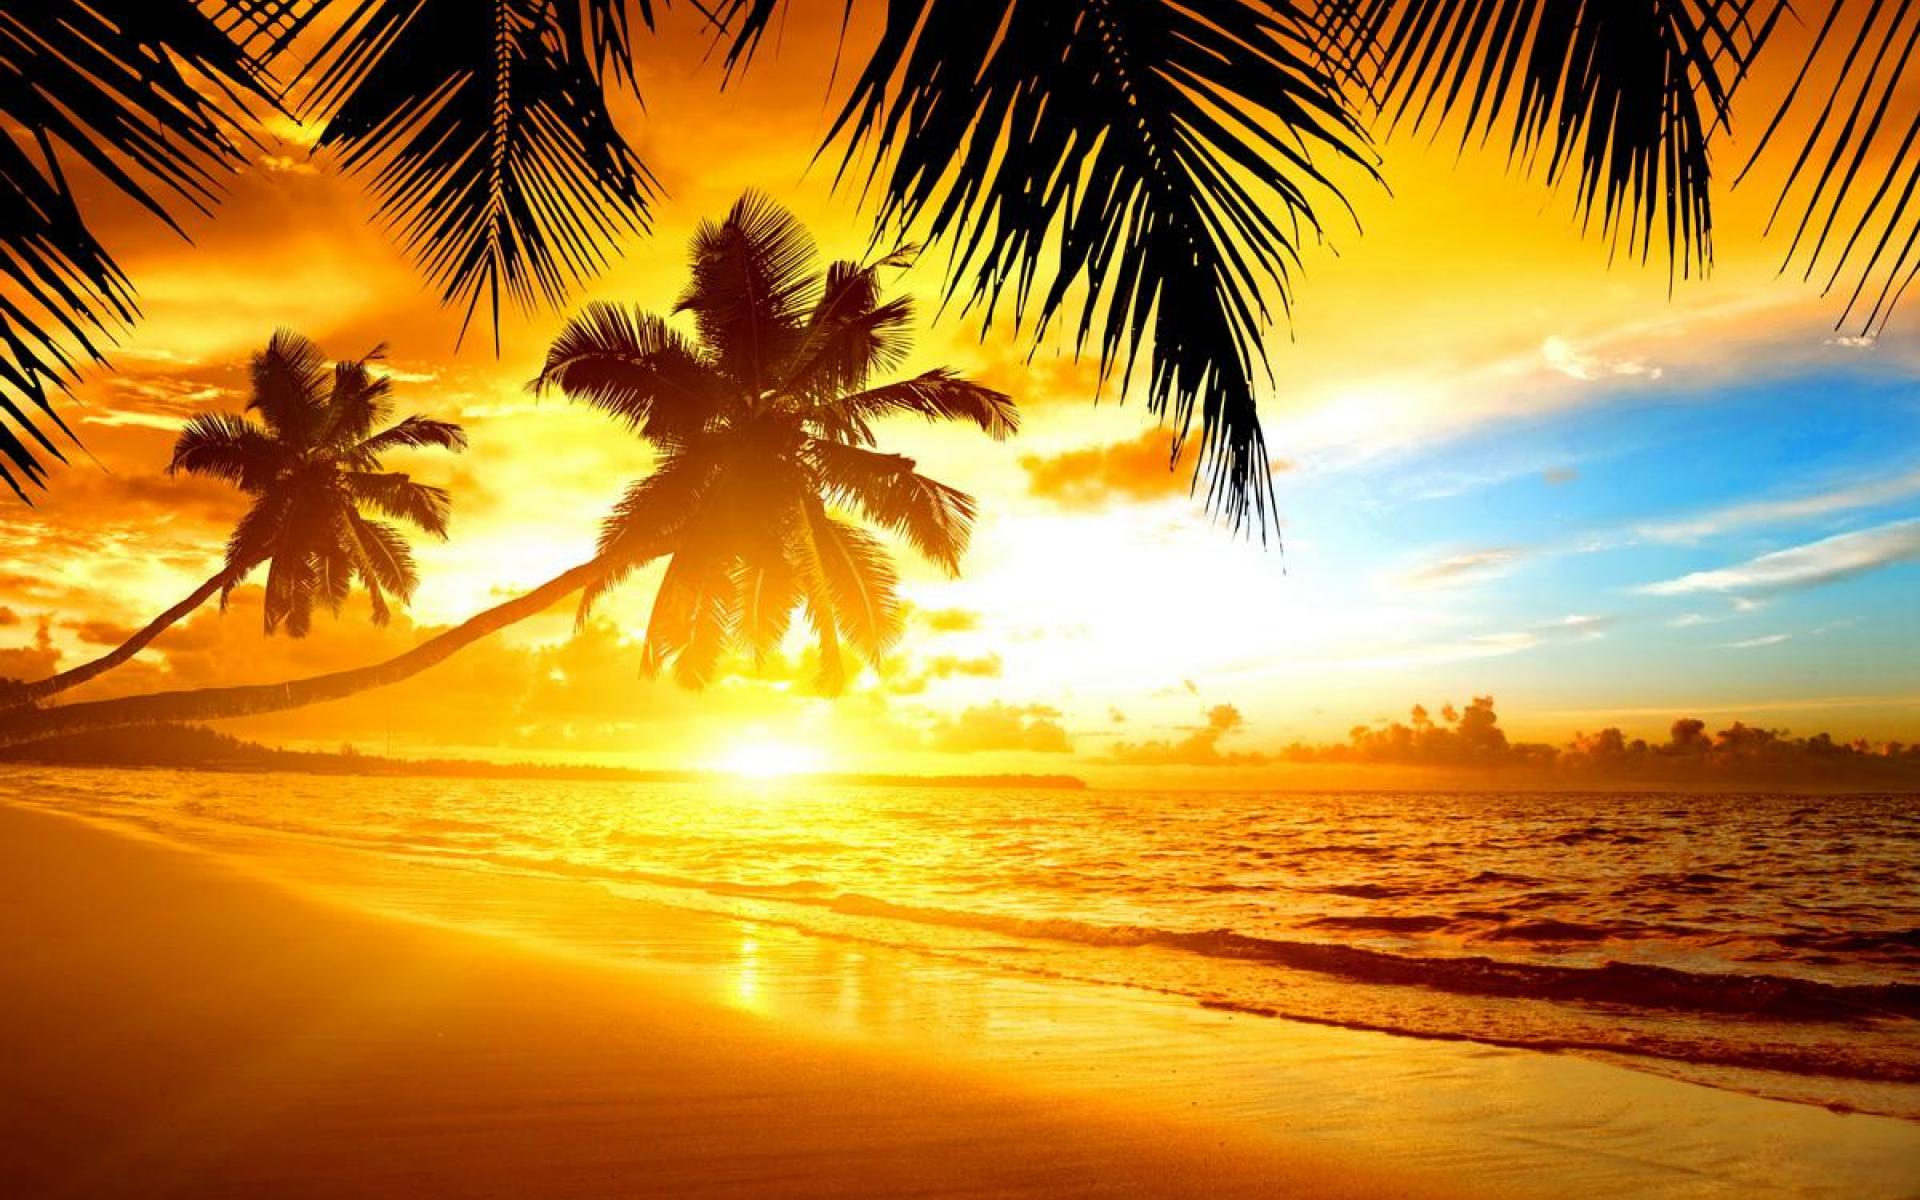 Large Tropical Island Sunset Wallpaper 1920x1200